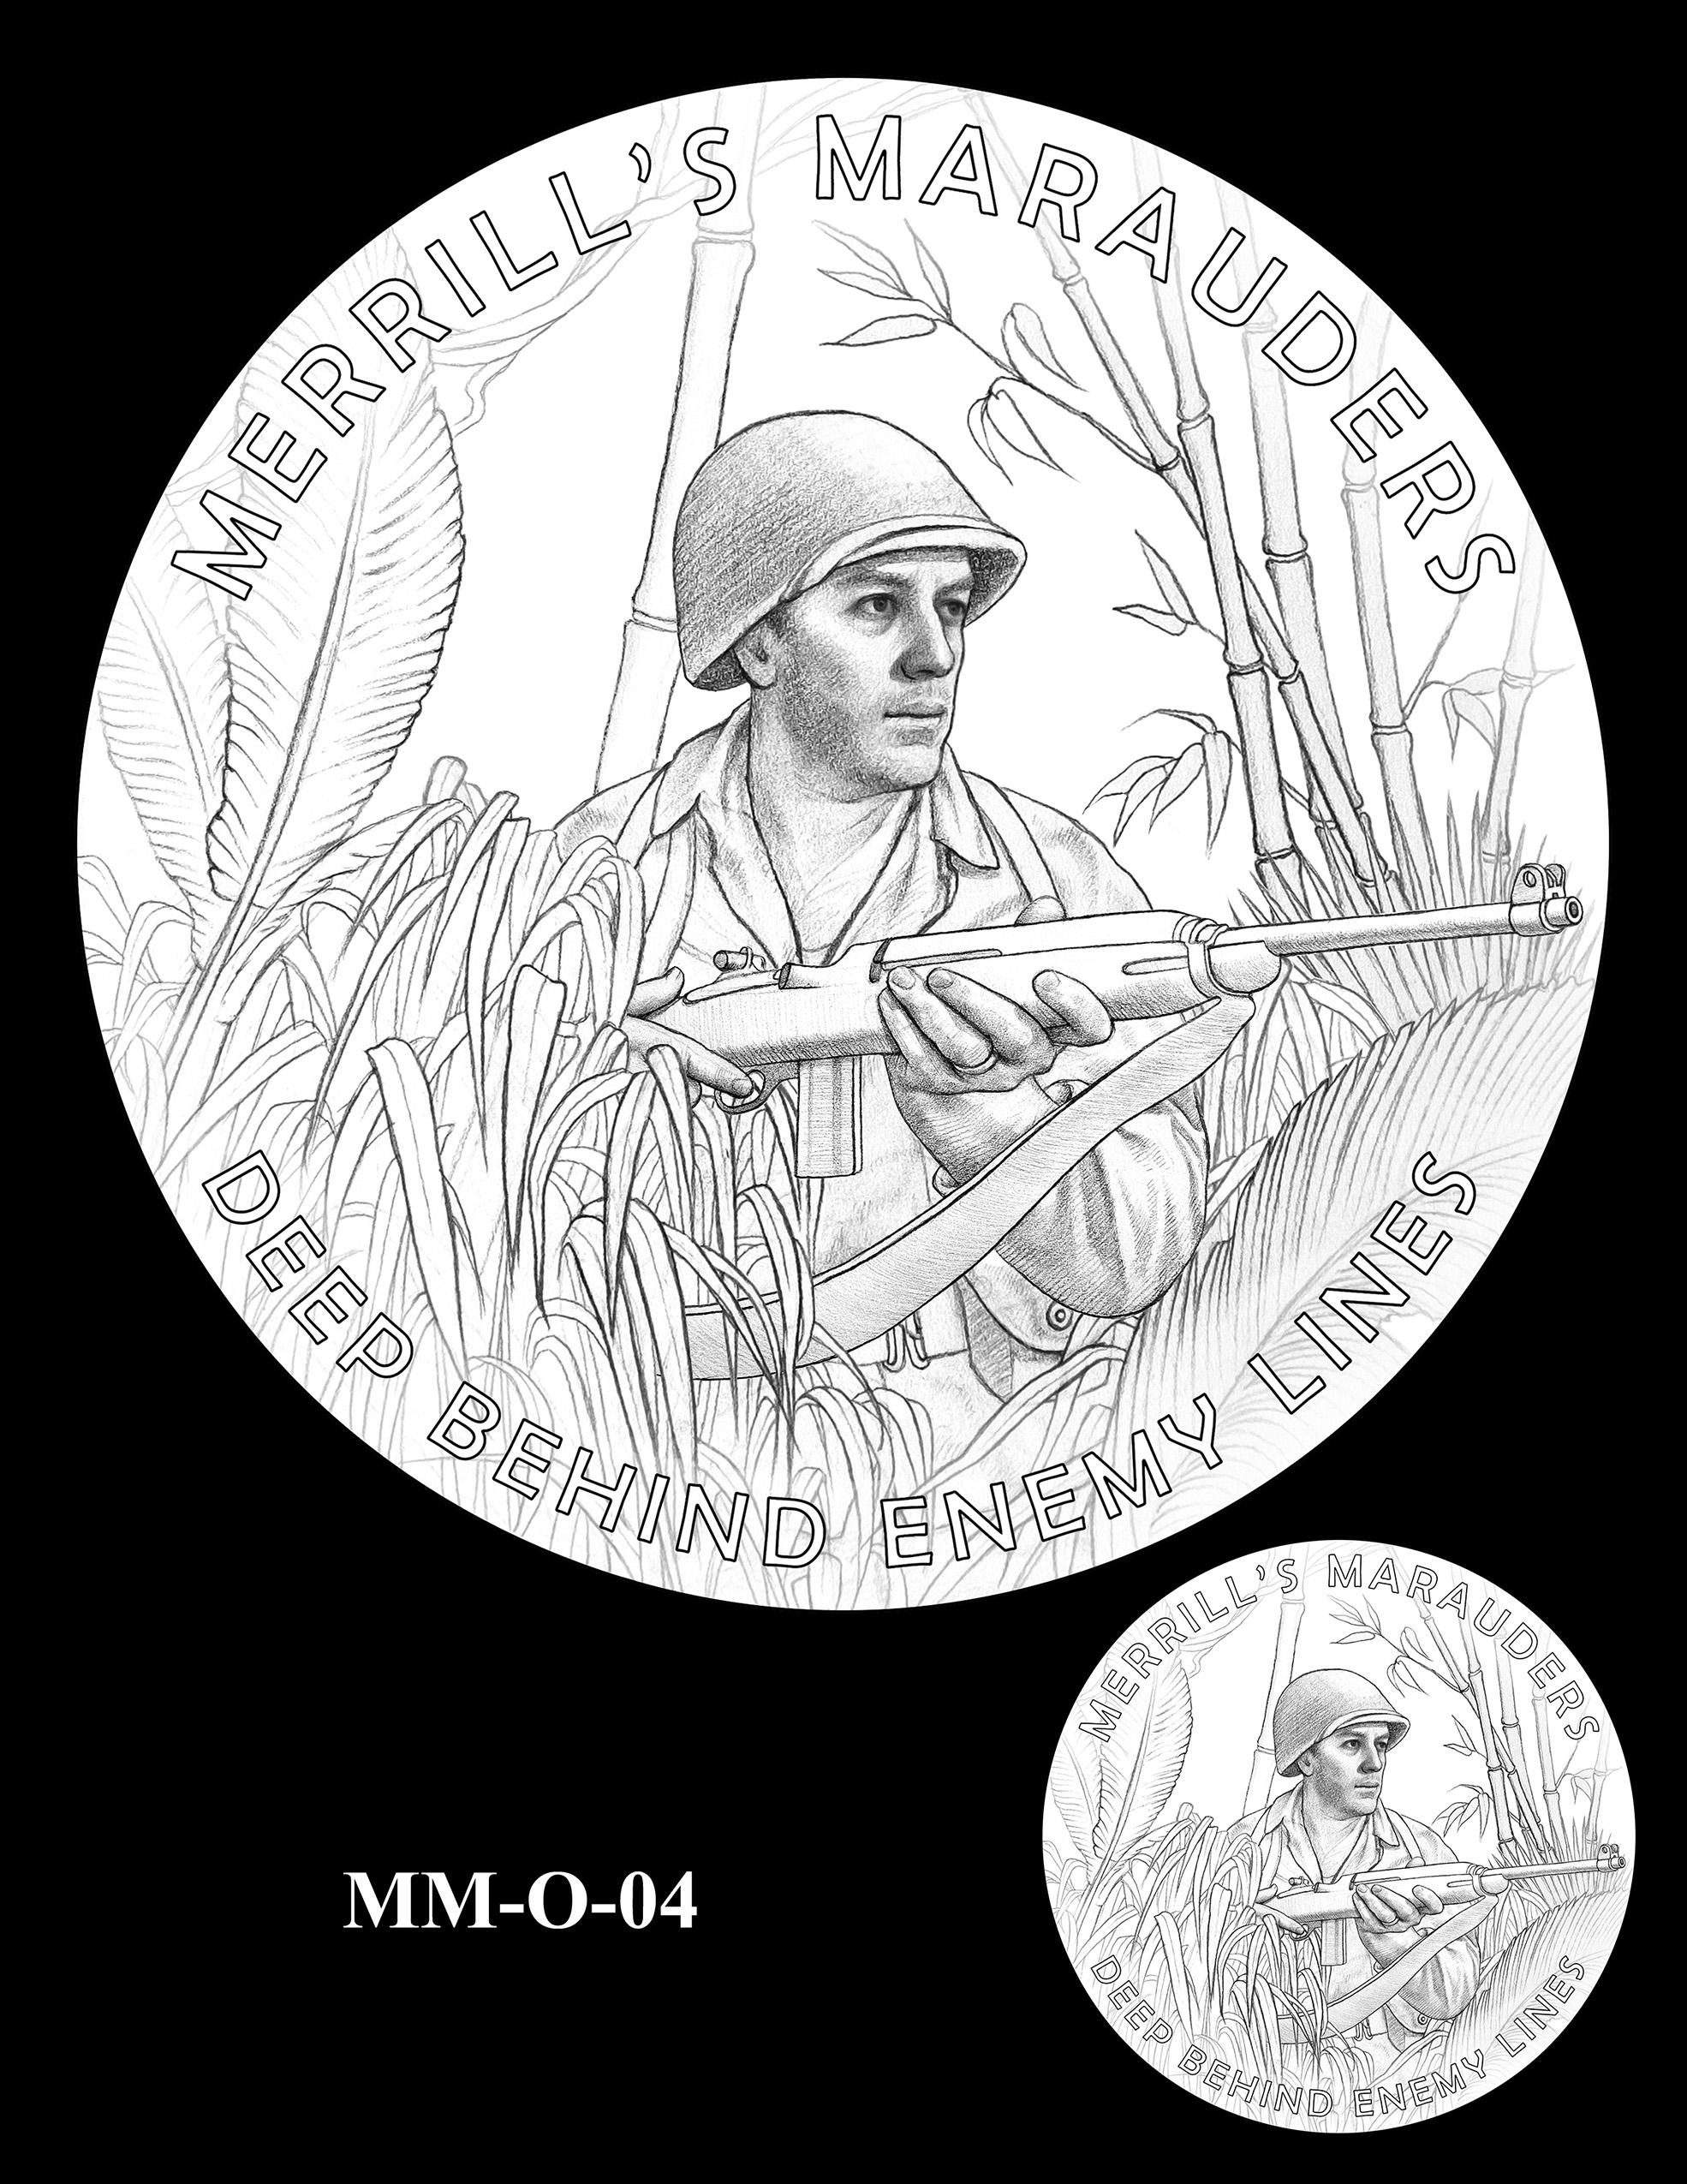 MM-O-04 -- Merrill's Marauders Congressional Gold Medal